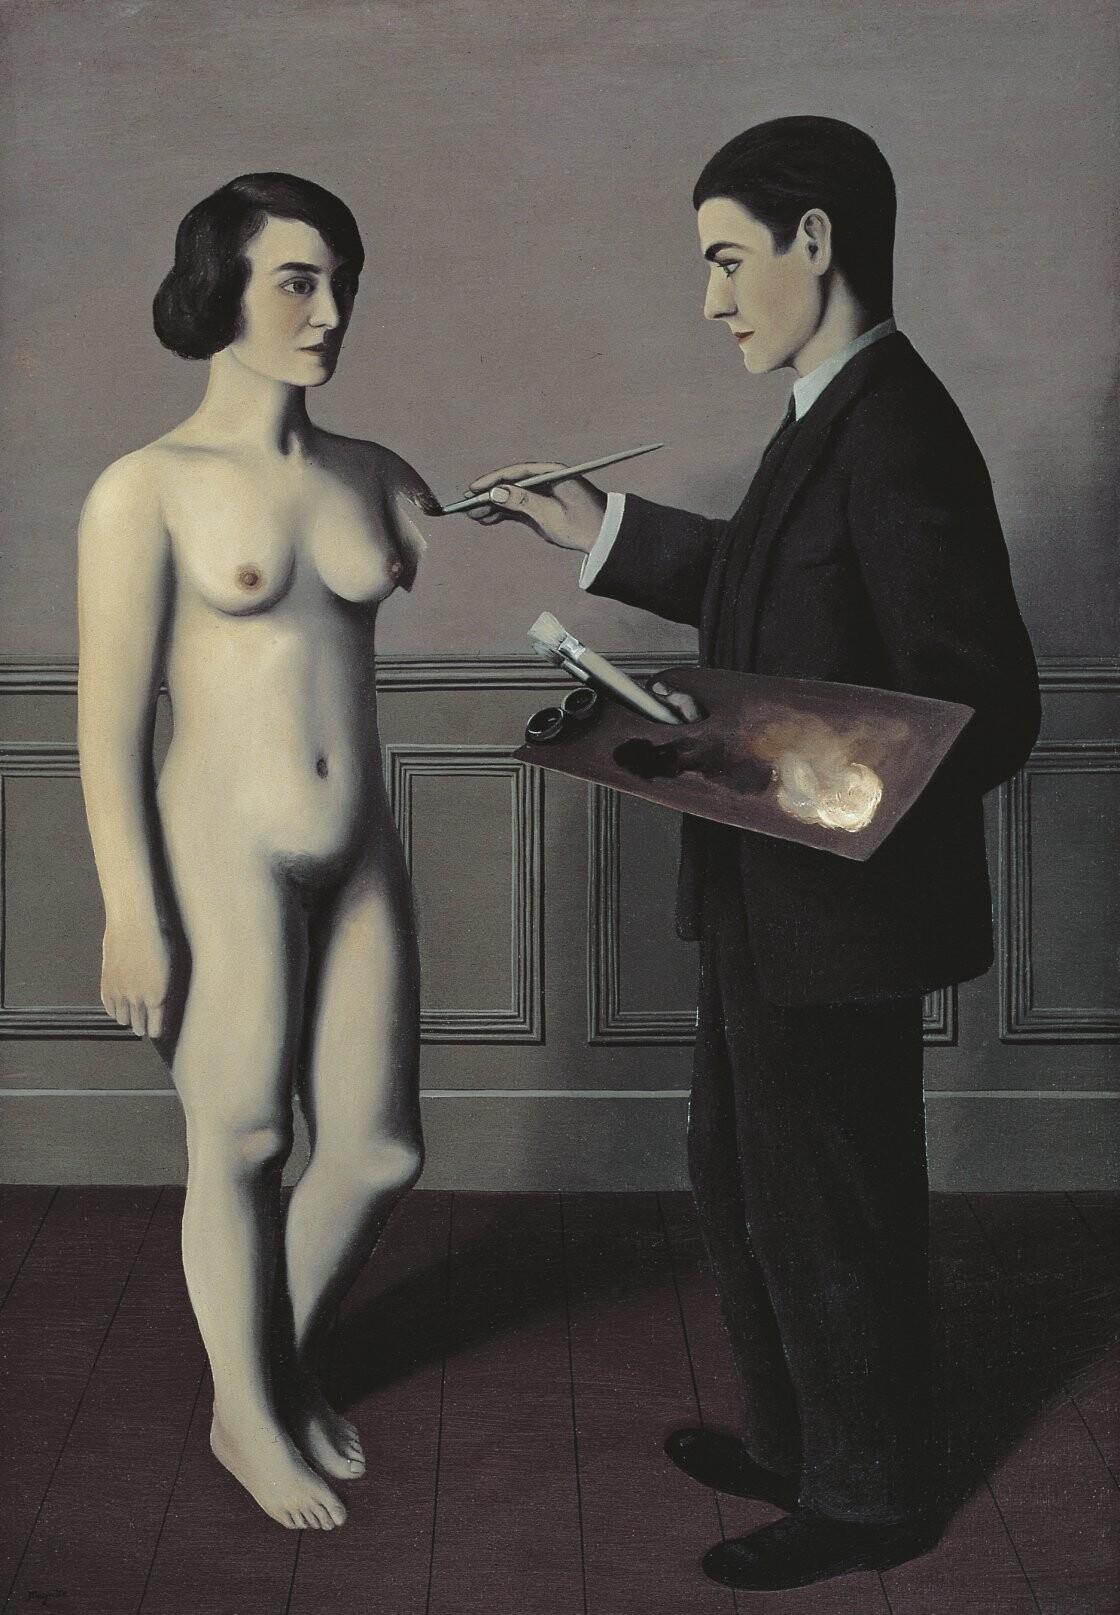 La tentativa de lo imposible. 1928. Magritte